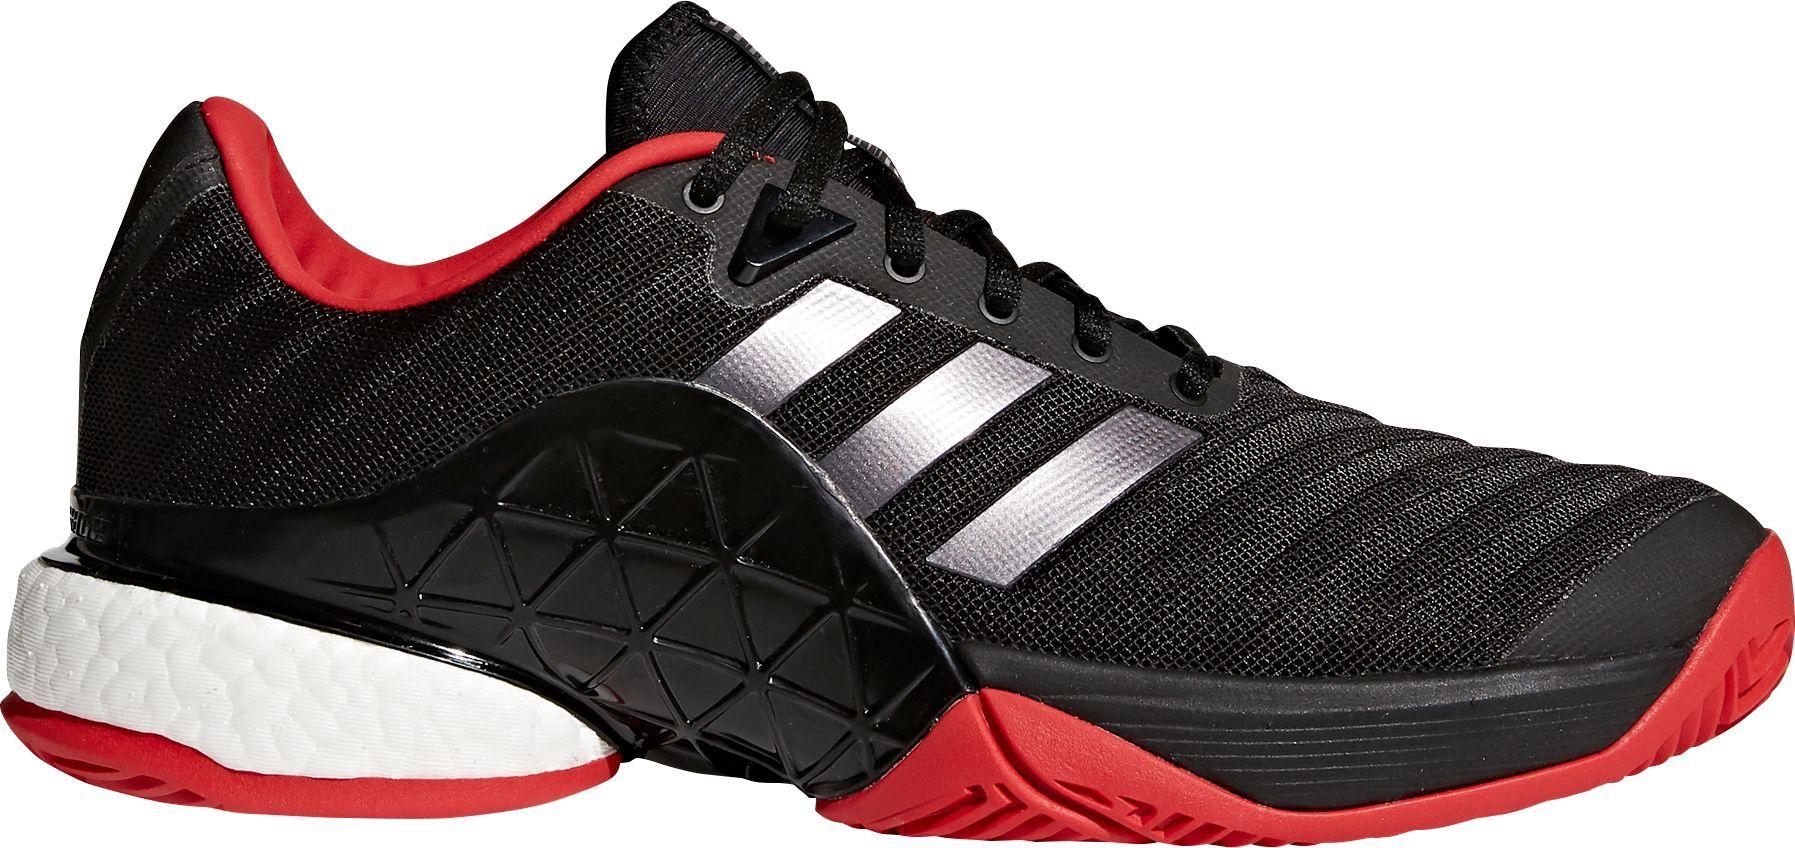 15a3c1c6140c5 adidas Men s Barricade 2018 Boost Tennis Shoes